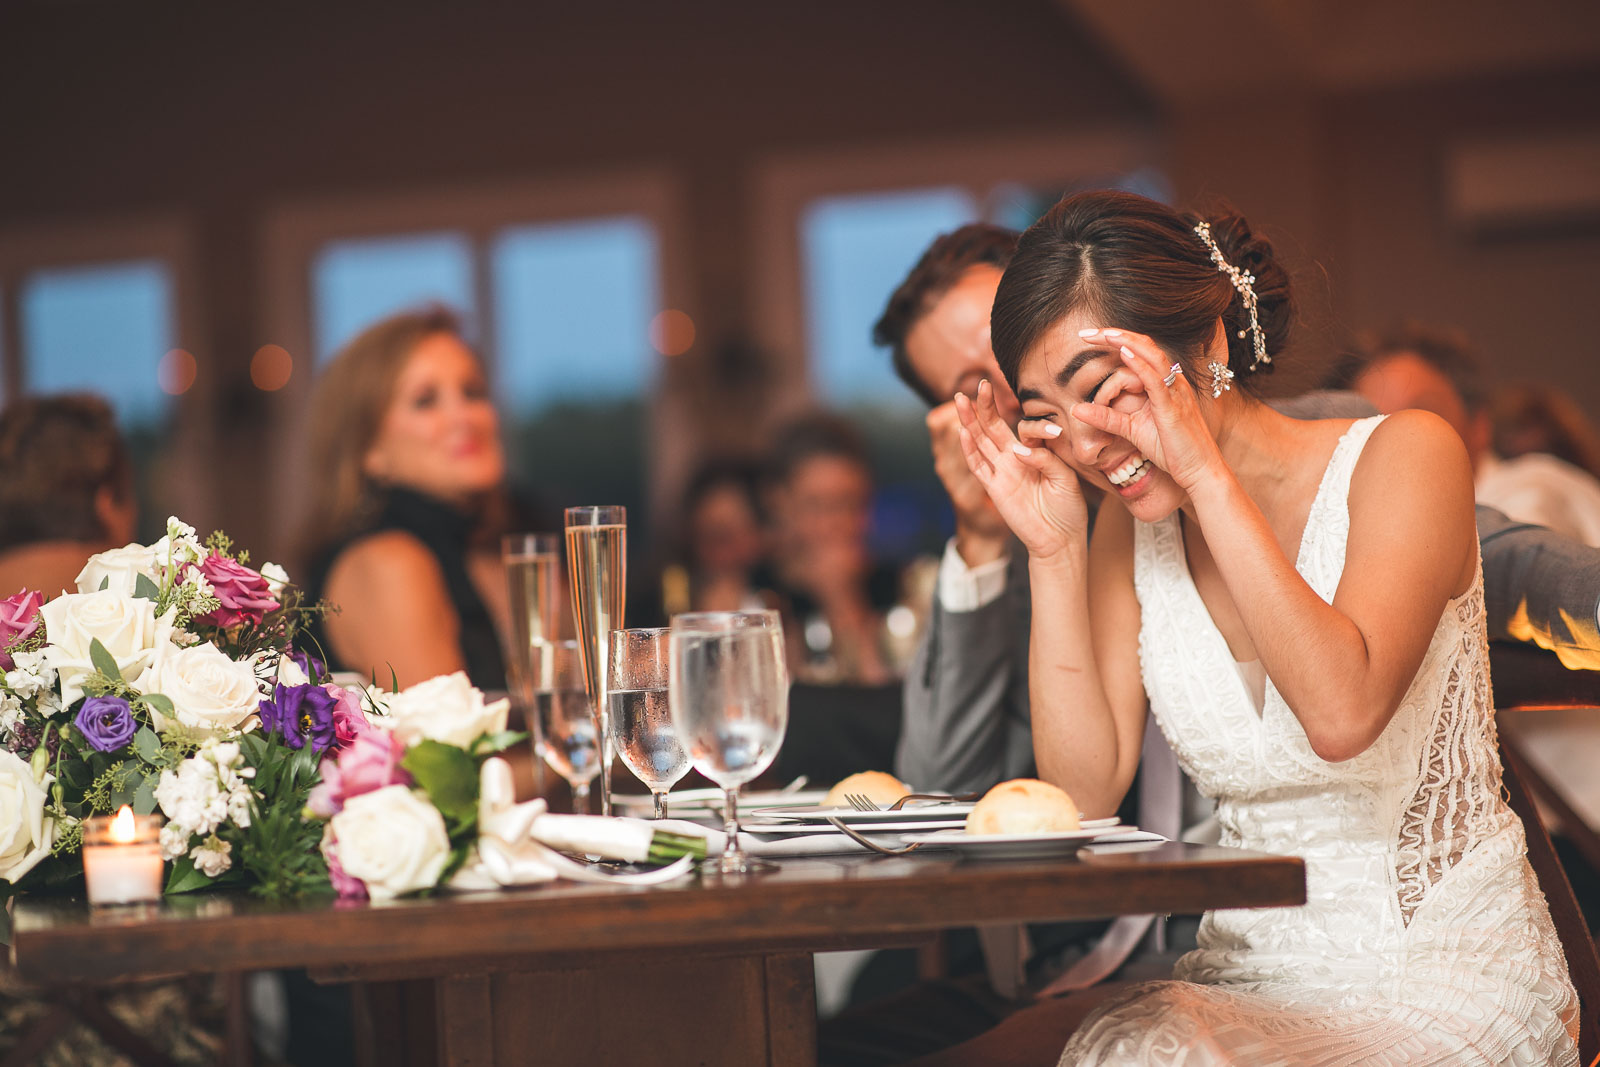 Bride tears of Joy